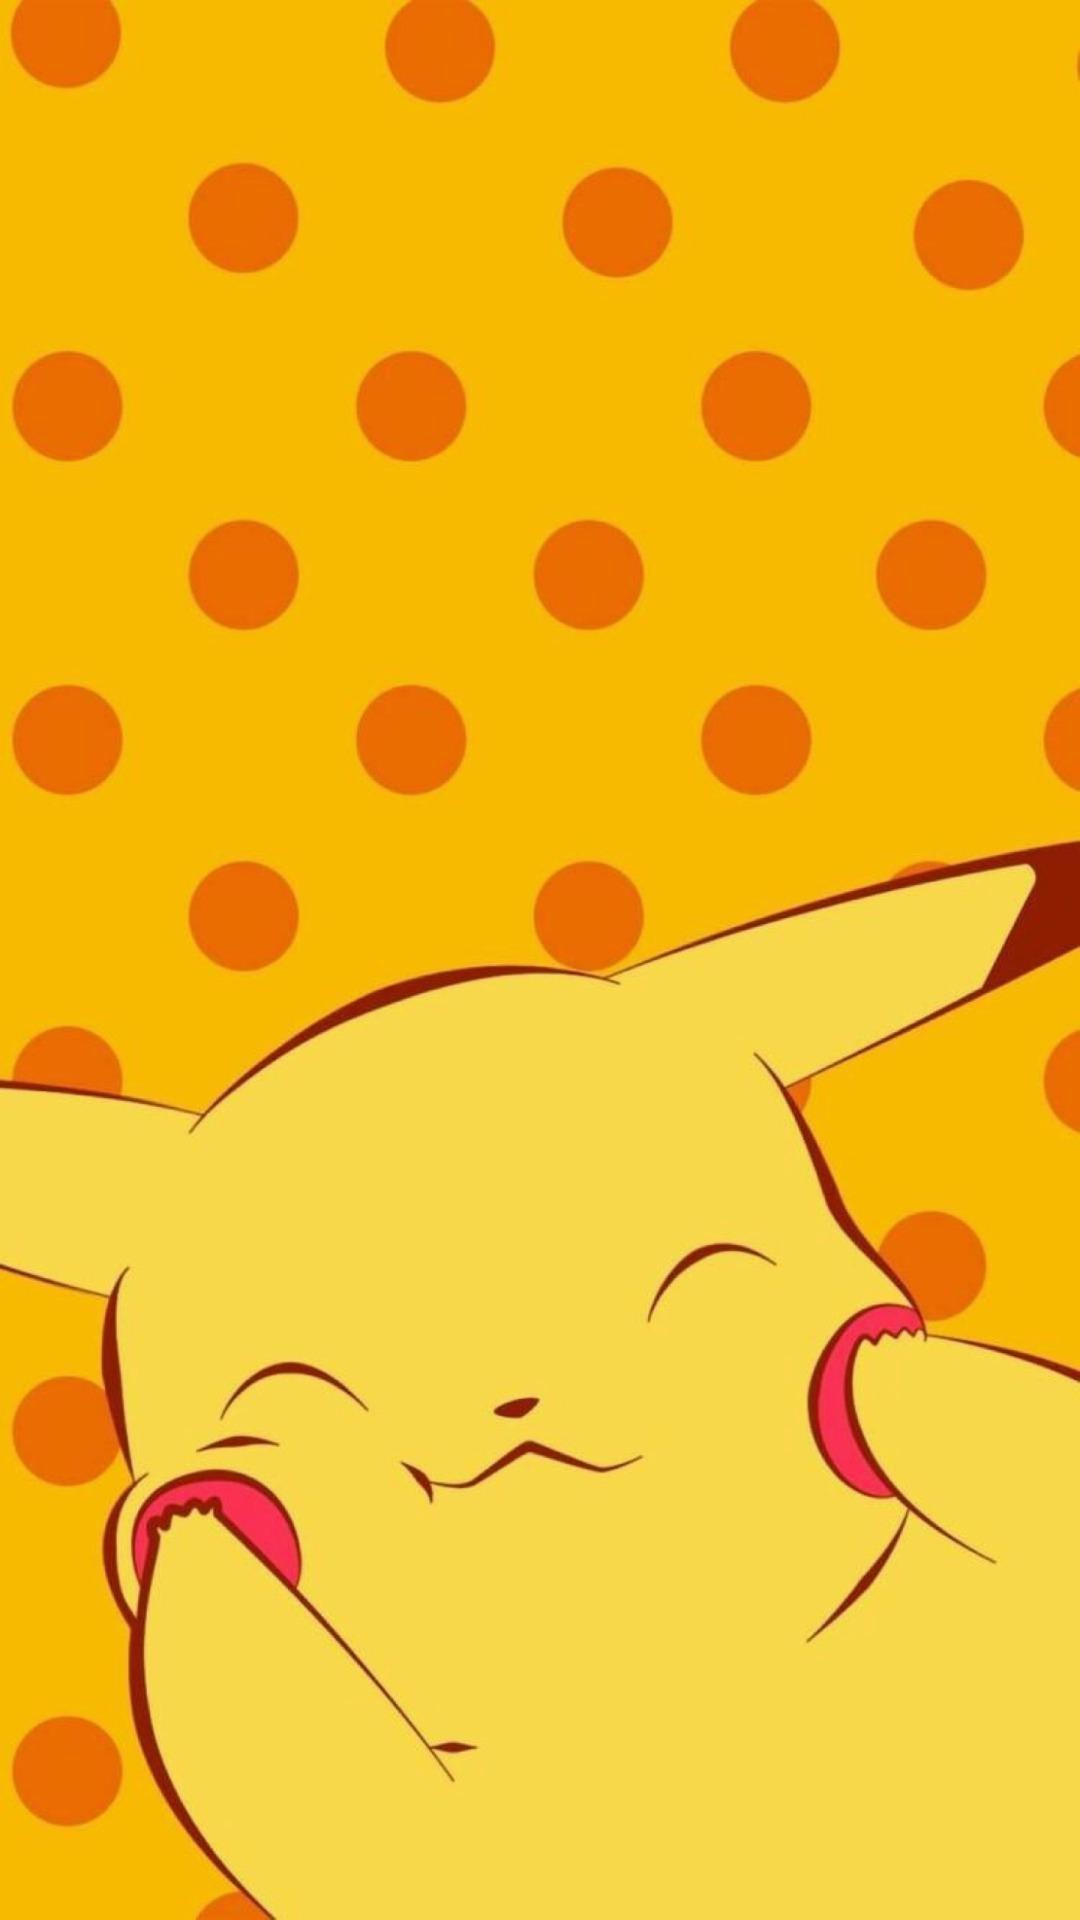 Pokemon-iPhone-Wallpaper-Images-Download-1